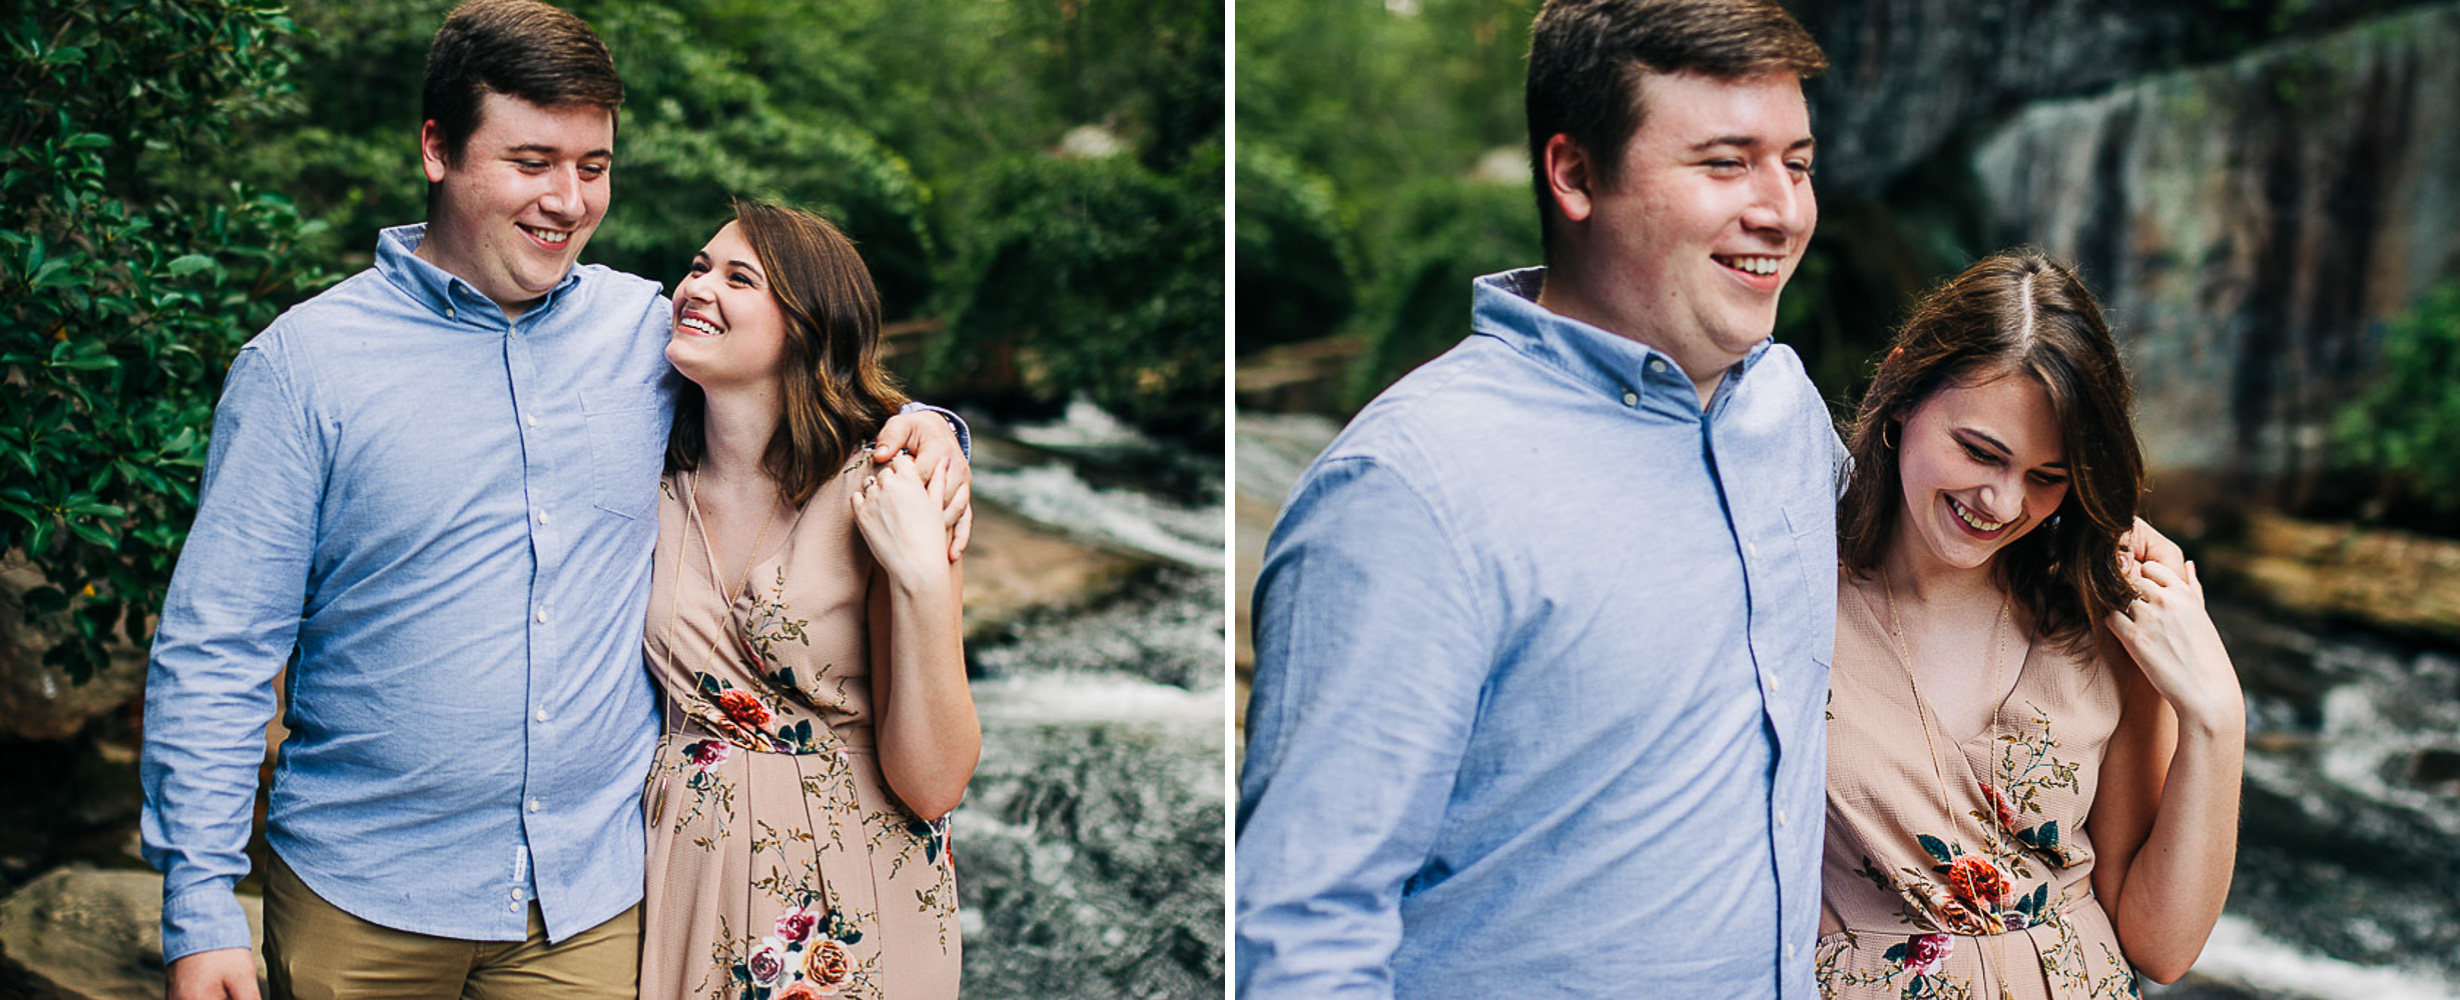 River Engagement Portraits, Summer Engagement Portraits, Engaged, South Carolina 24.jpg